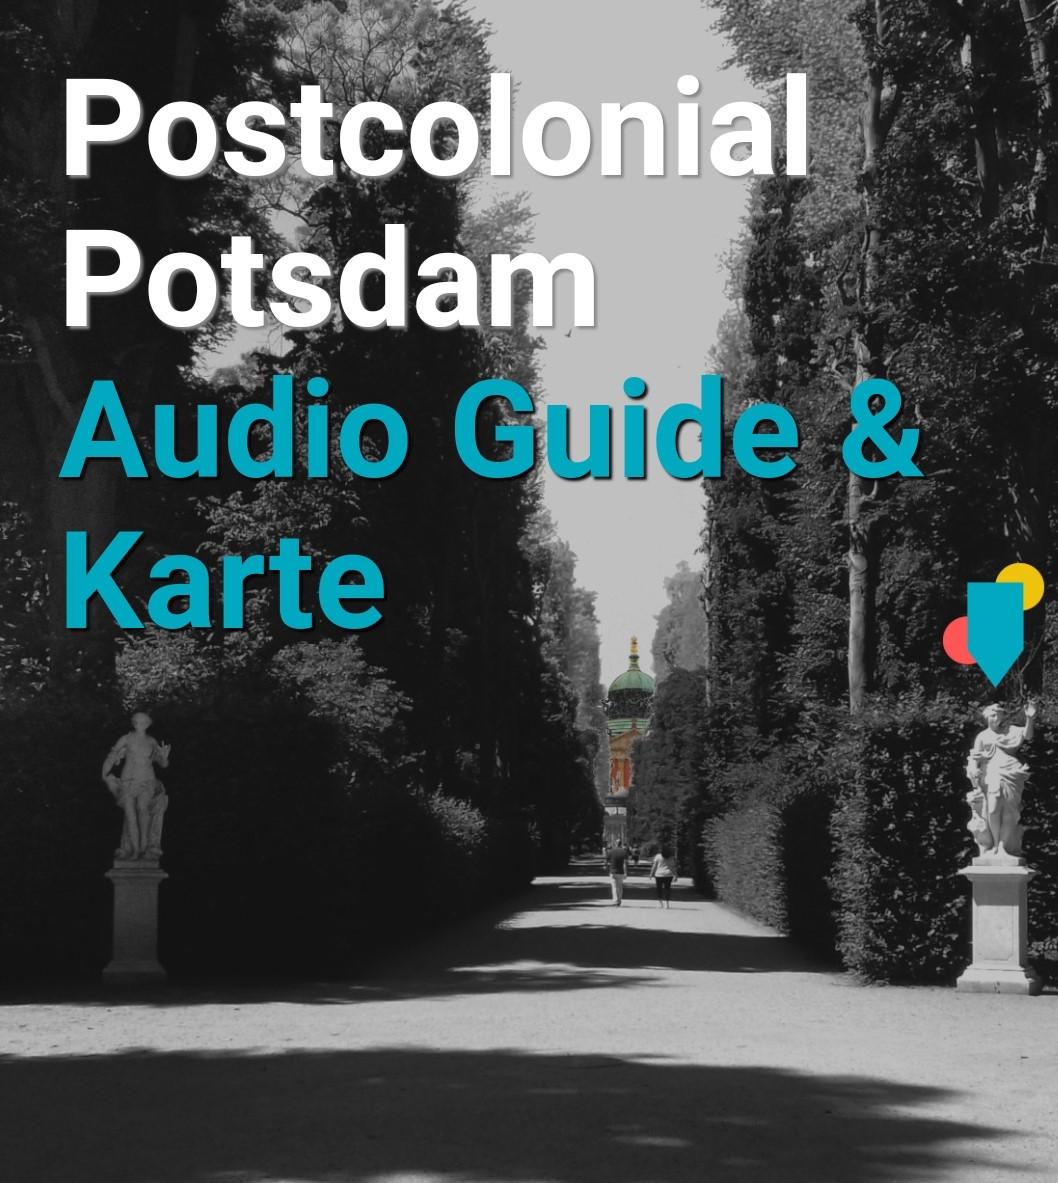 Potsdam Postkolonial: Digitale Einblicke in die deutsche Kolonialgeschichte